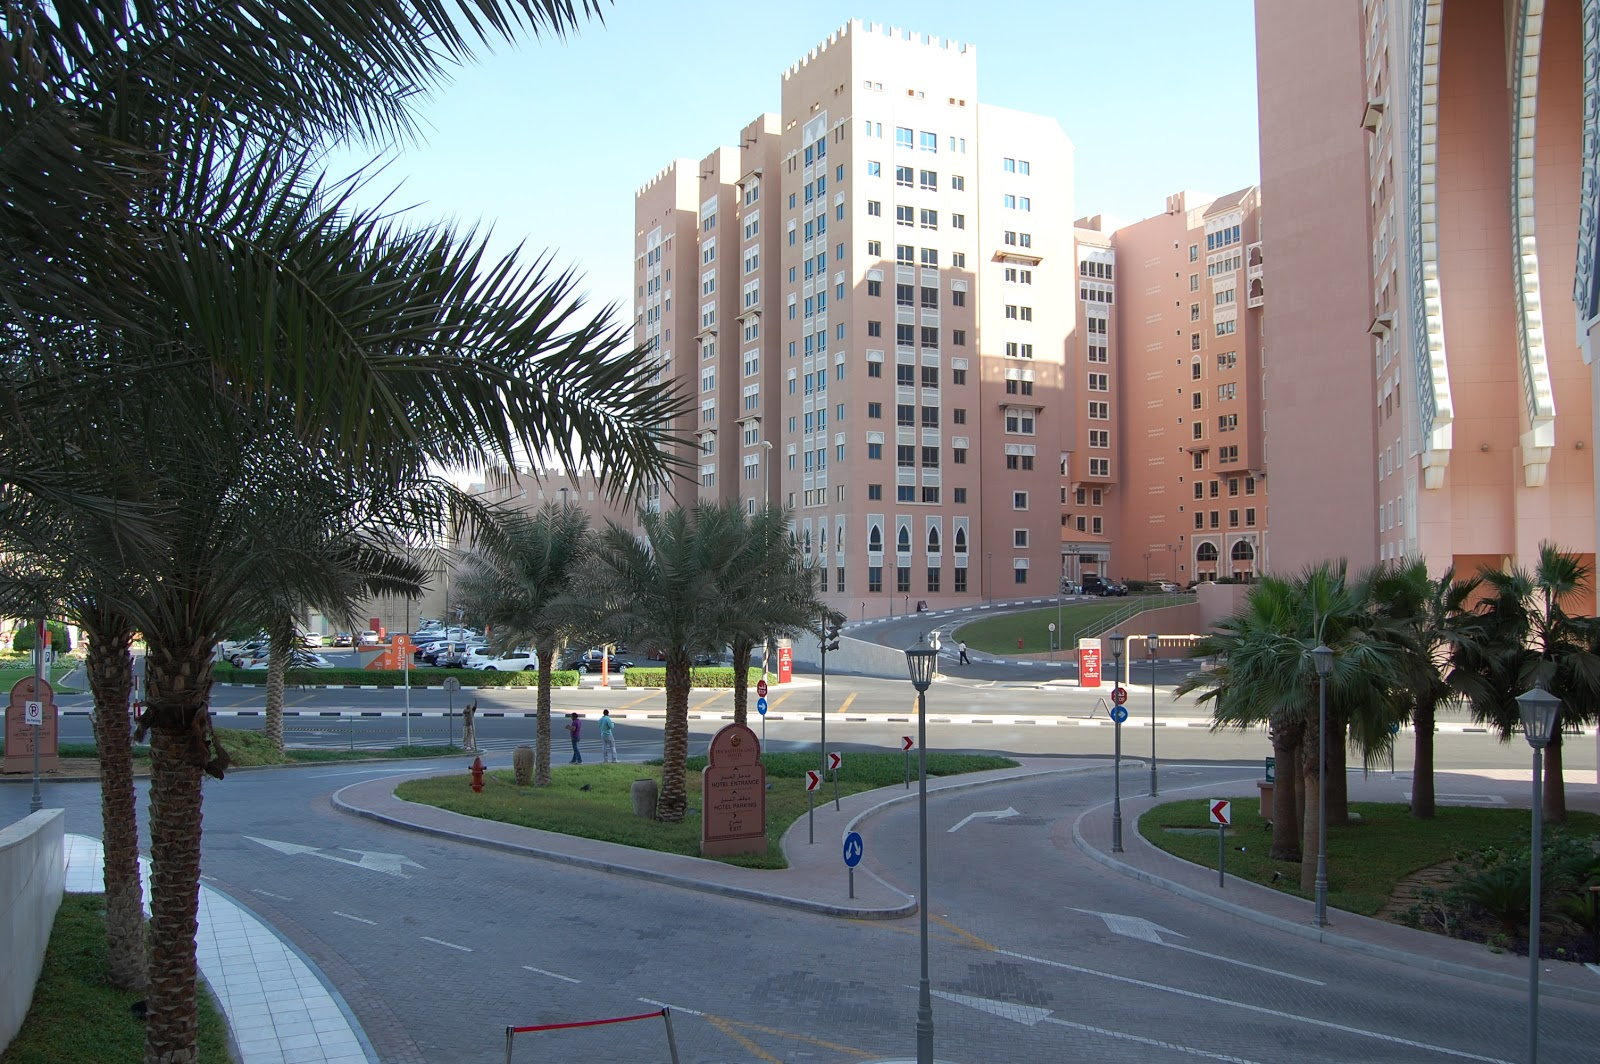 Ibn battuta gate hotel dubai uae dinodxbdino for Hotel di dubai